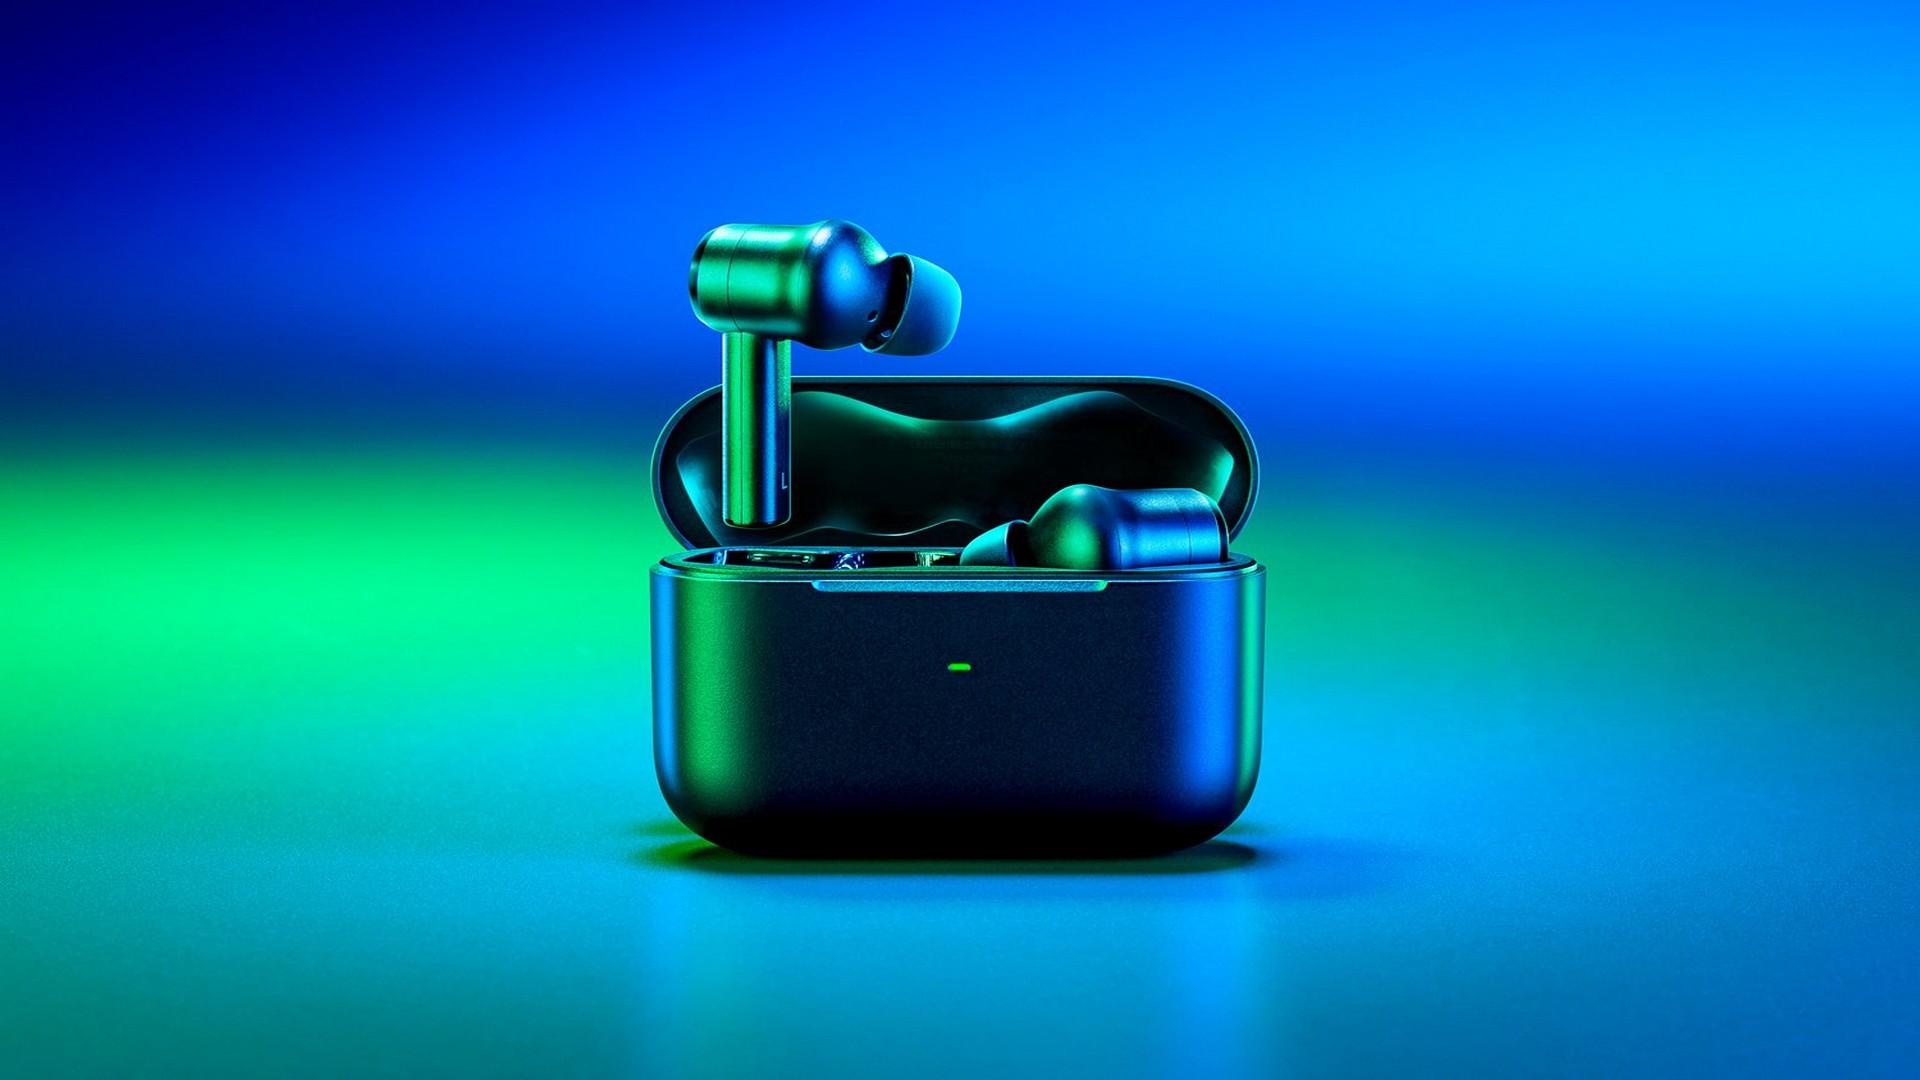 Free Yourself From Noise & Enjoy THX Certified Audio With The Razer Hammerhead True Wireless Pro Earbuds